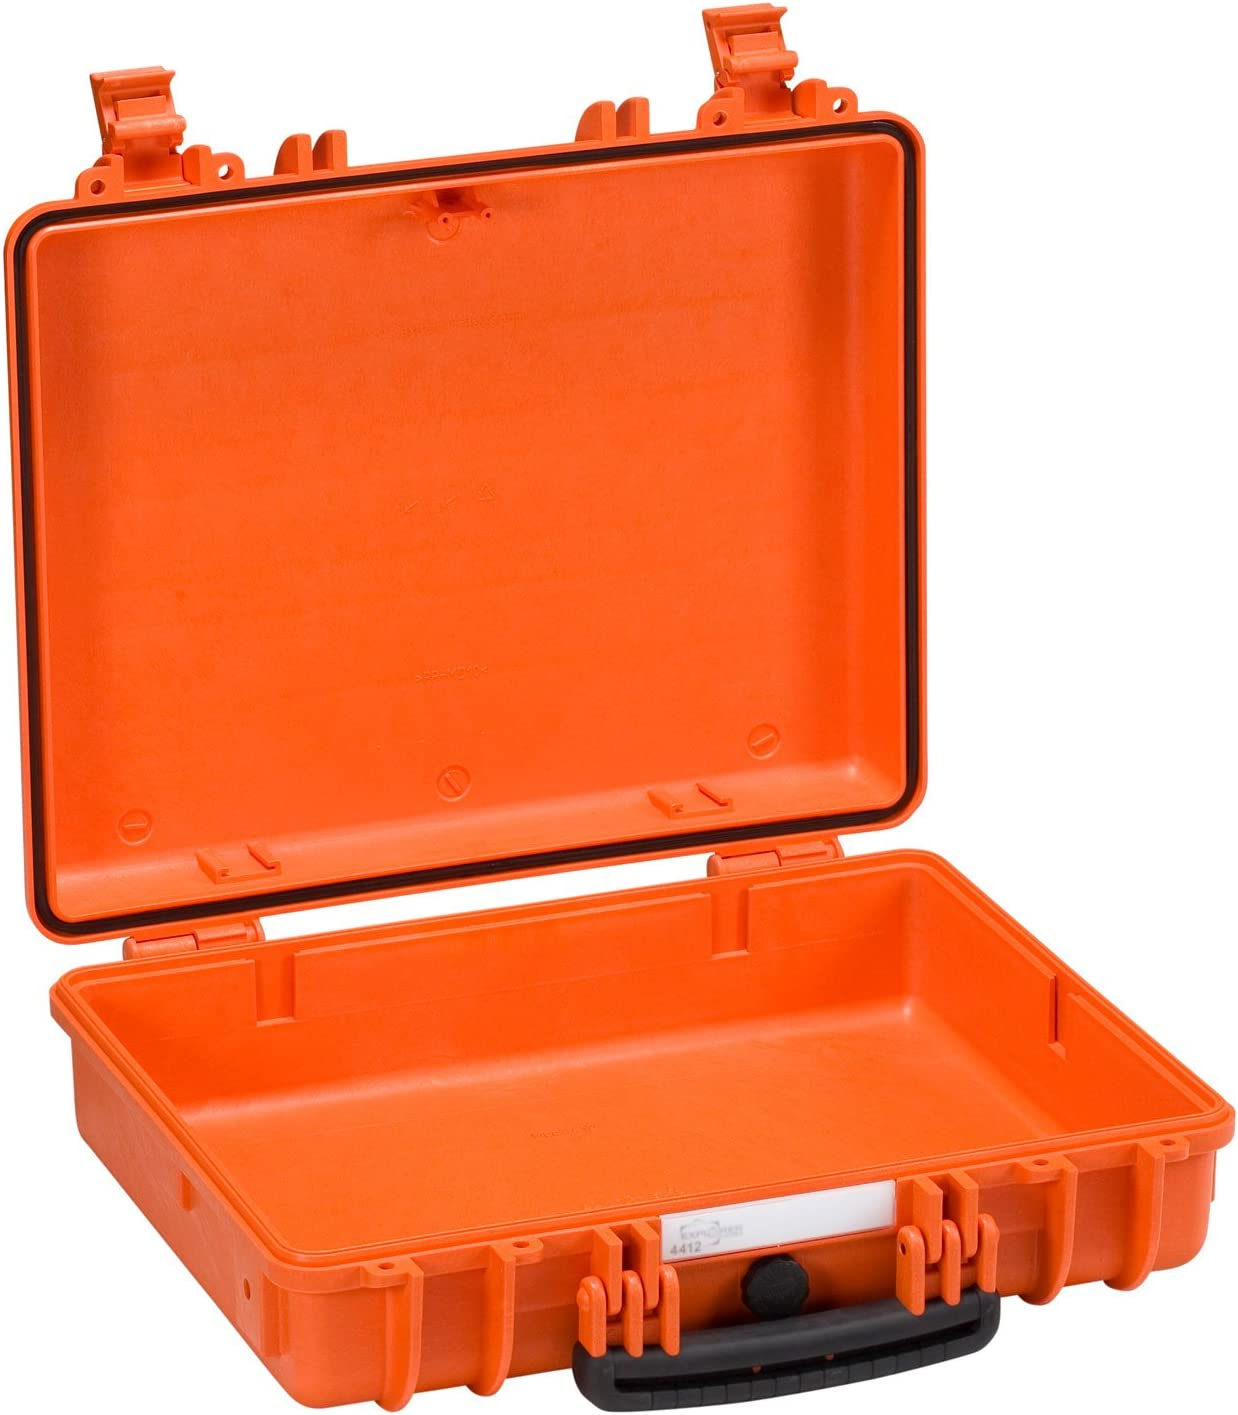 Explorer Cases 4820 GE Waterproof Dustproof Multi-Purpose Protective Case Empty Military Green